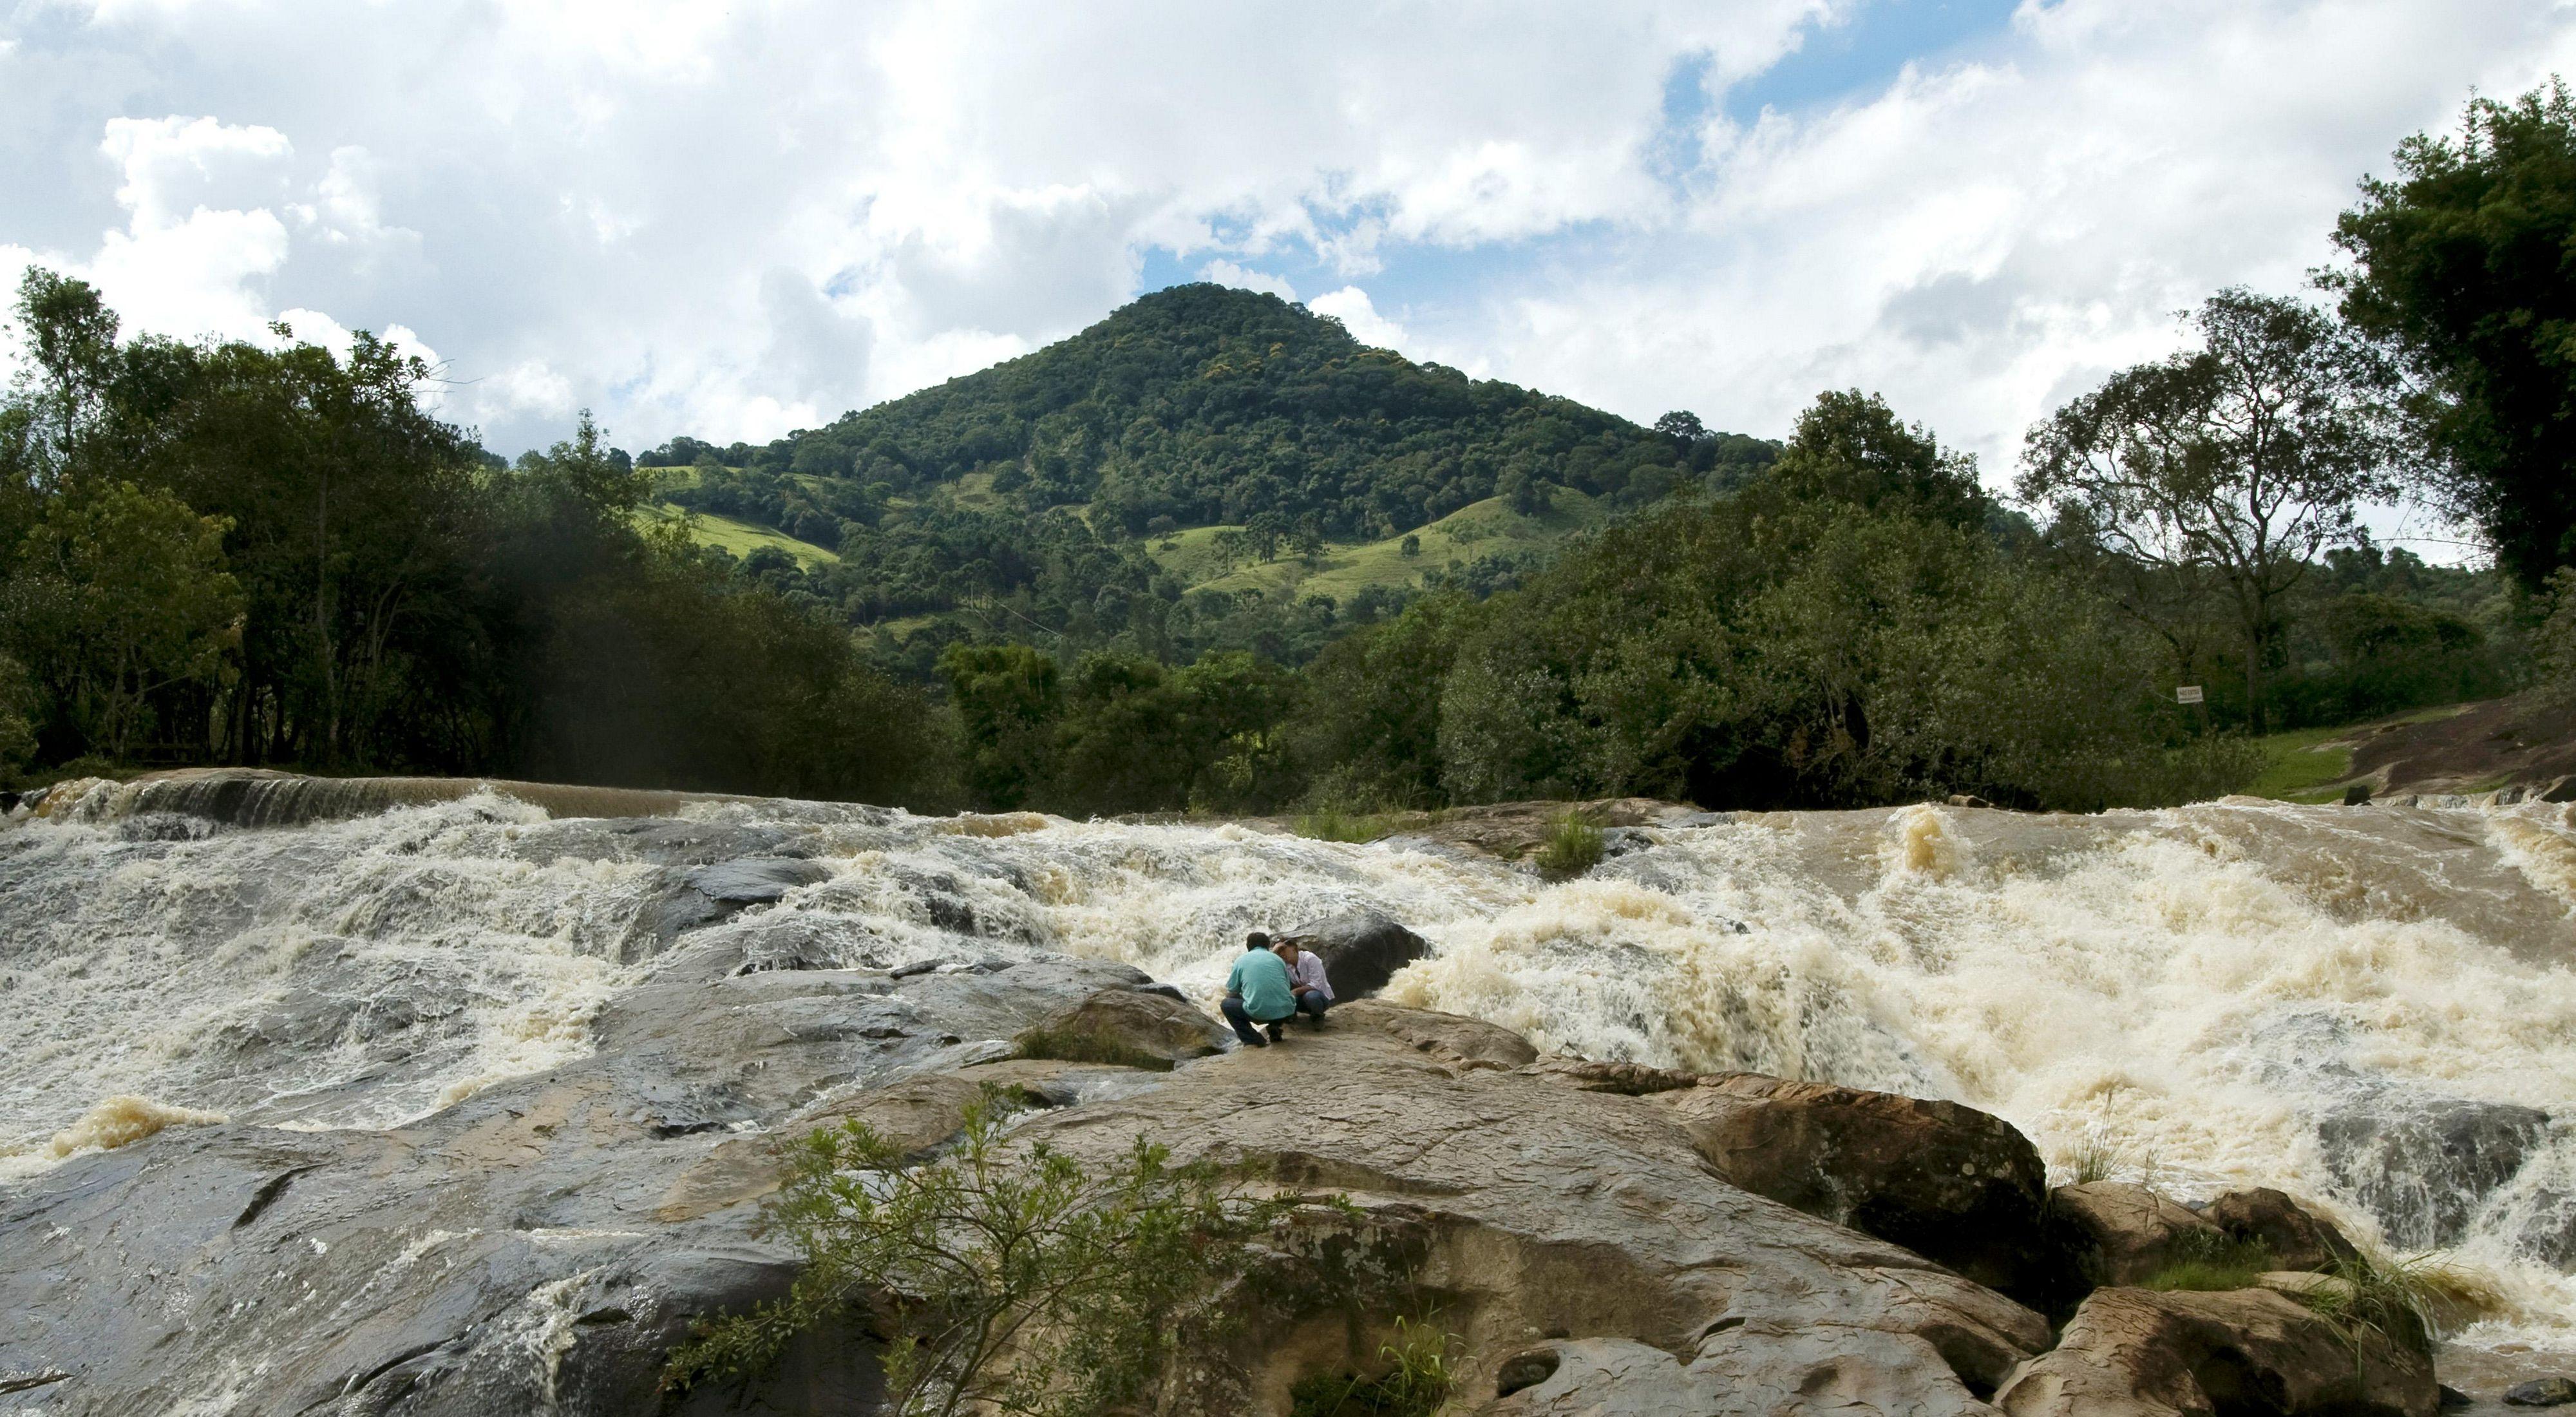 En la cuenca hidrográfica Piracicaba-Capivari-Jundia in Sao Paulo, Brasil